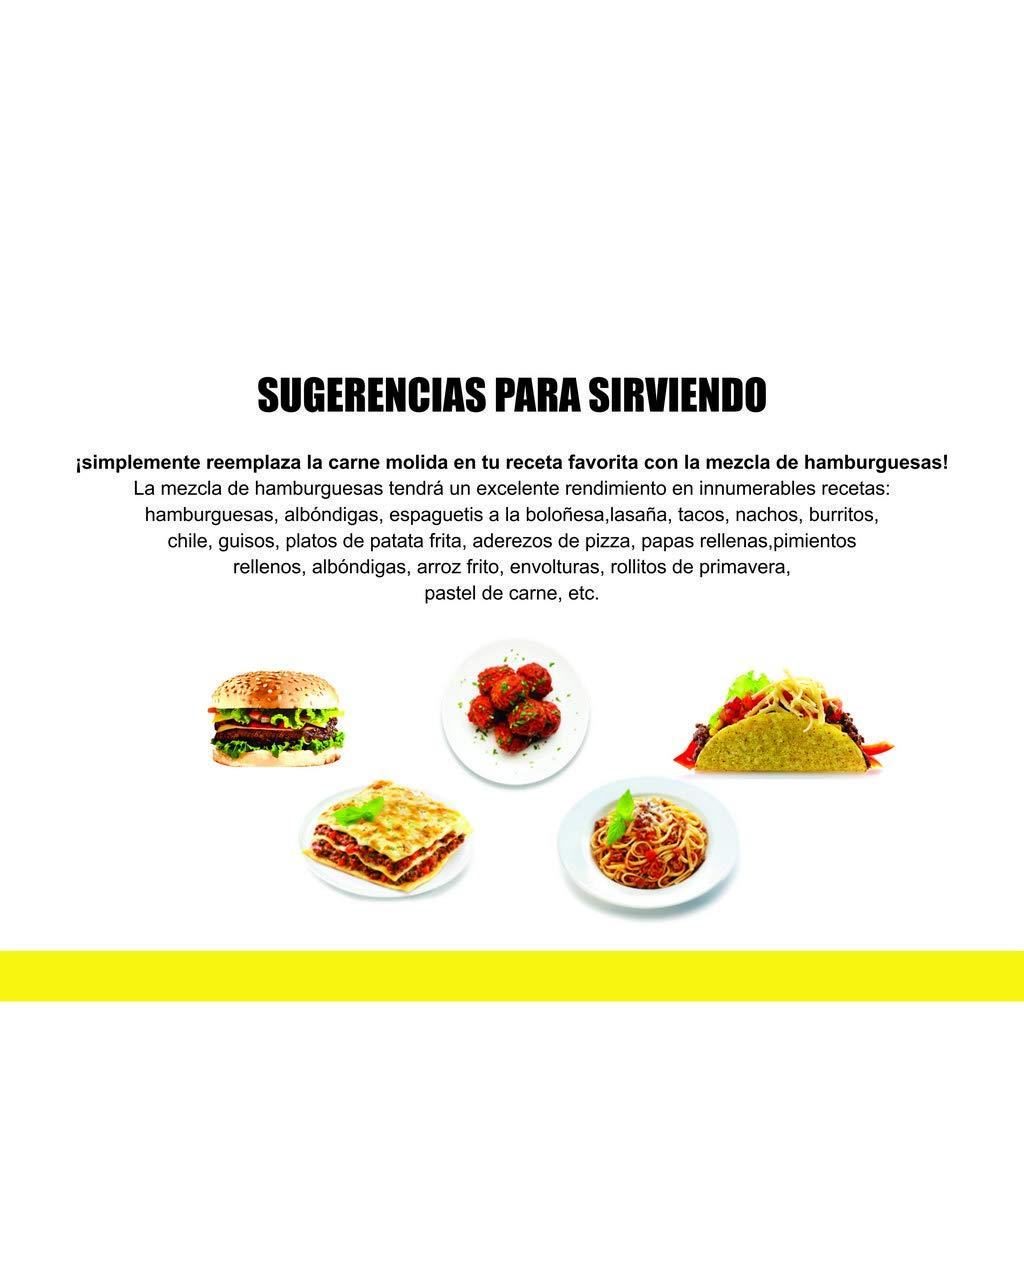 Multi-Packs > Sustitutos de Carne y Sustitutos de Huevo : vEGGs Sustituto de Huevo 100% Vegano basado en plantas | Mezcla de Hamburguesas Veganas ...